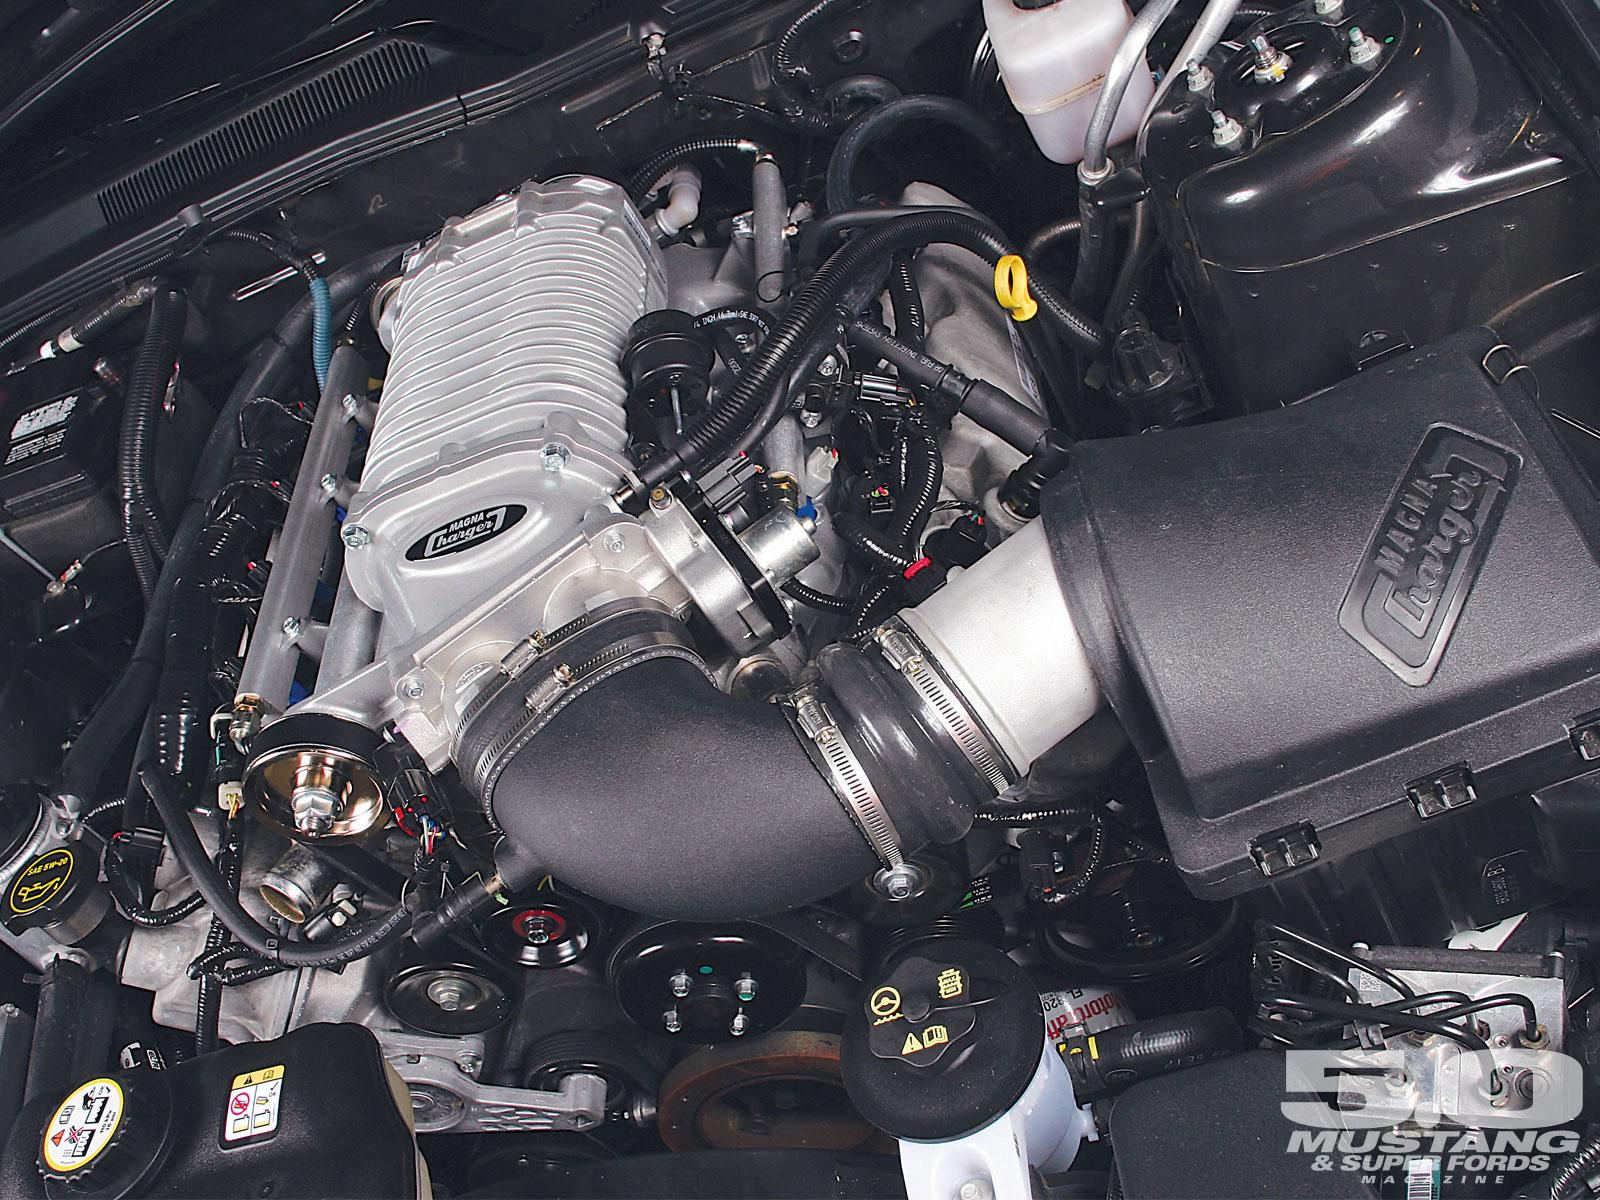 M5lp 0704 01 O Magnacharger Intercooled Supercharger GT Blower Kit